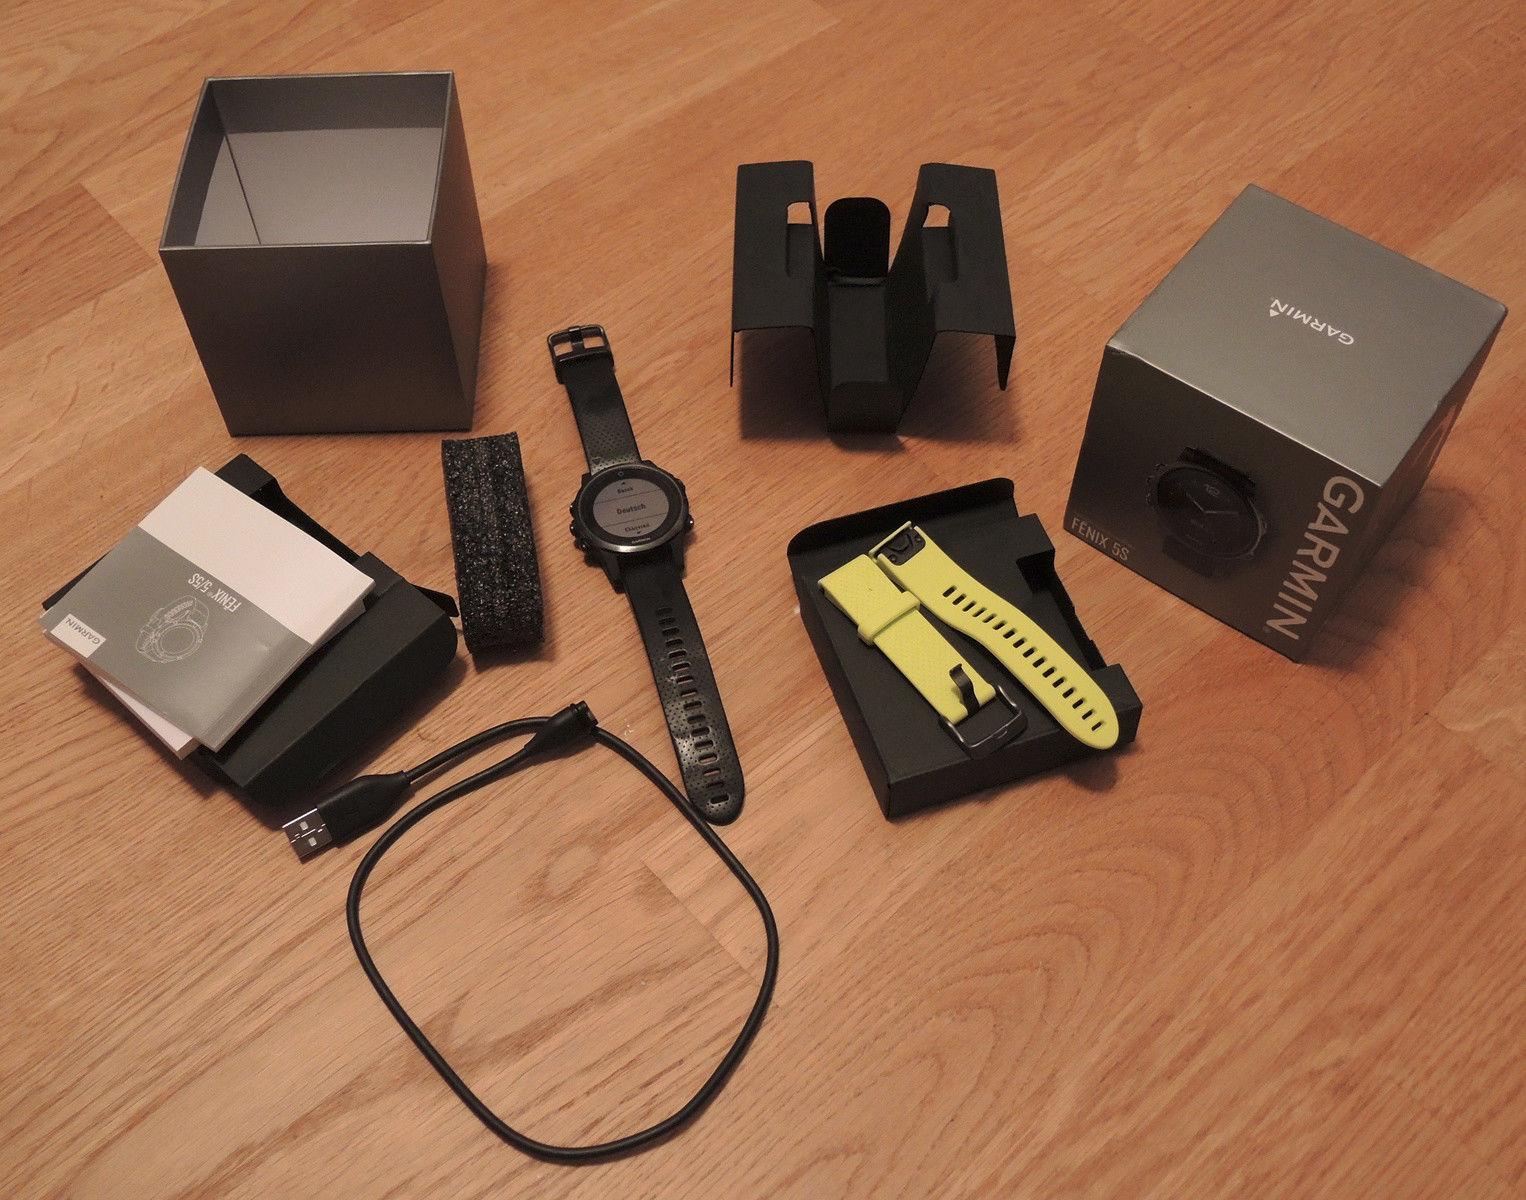 Garmin fenix 5S - Saphirglas-Edition - Schwarz mit schwarzem Armband